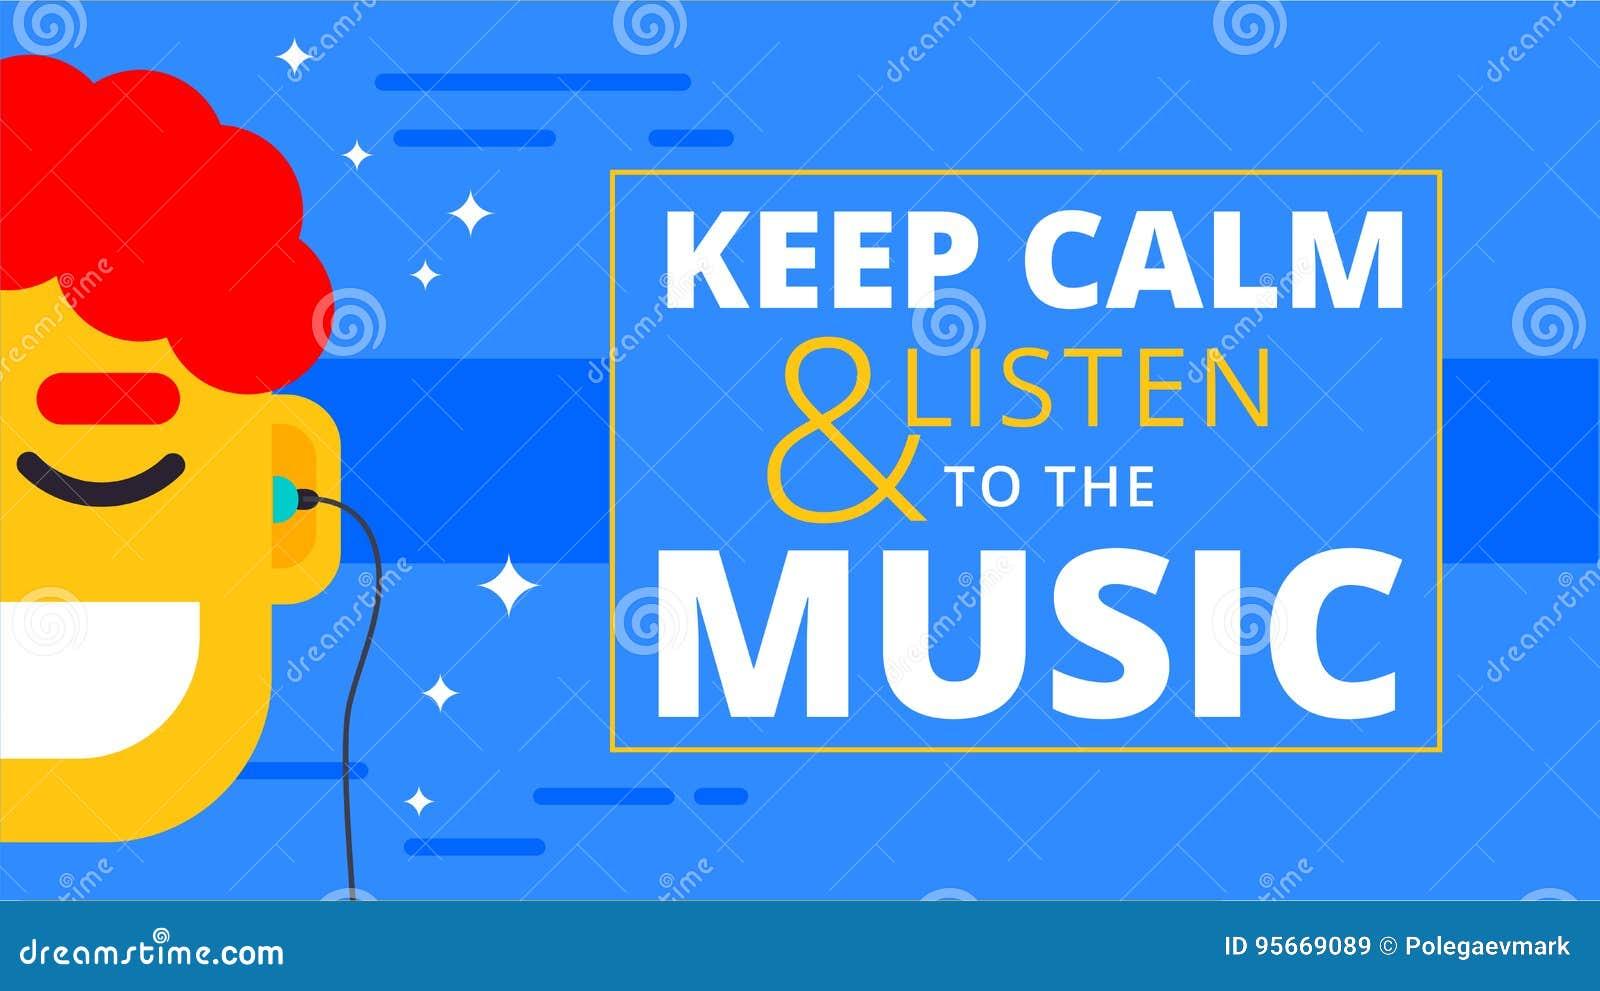 Music Motivational Wallpaper In Flat Design Happy Man Listening